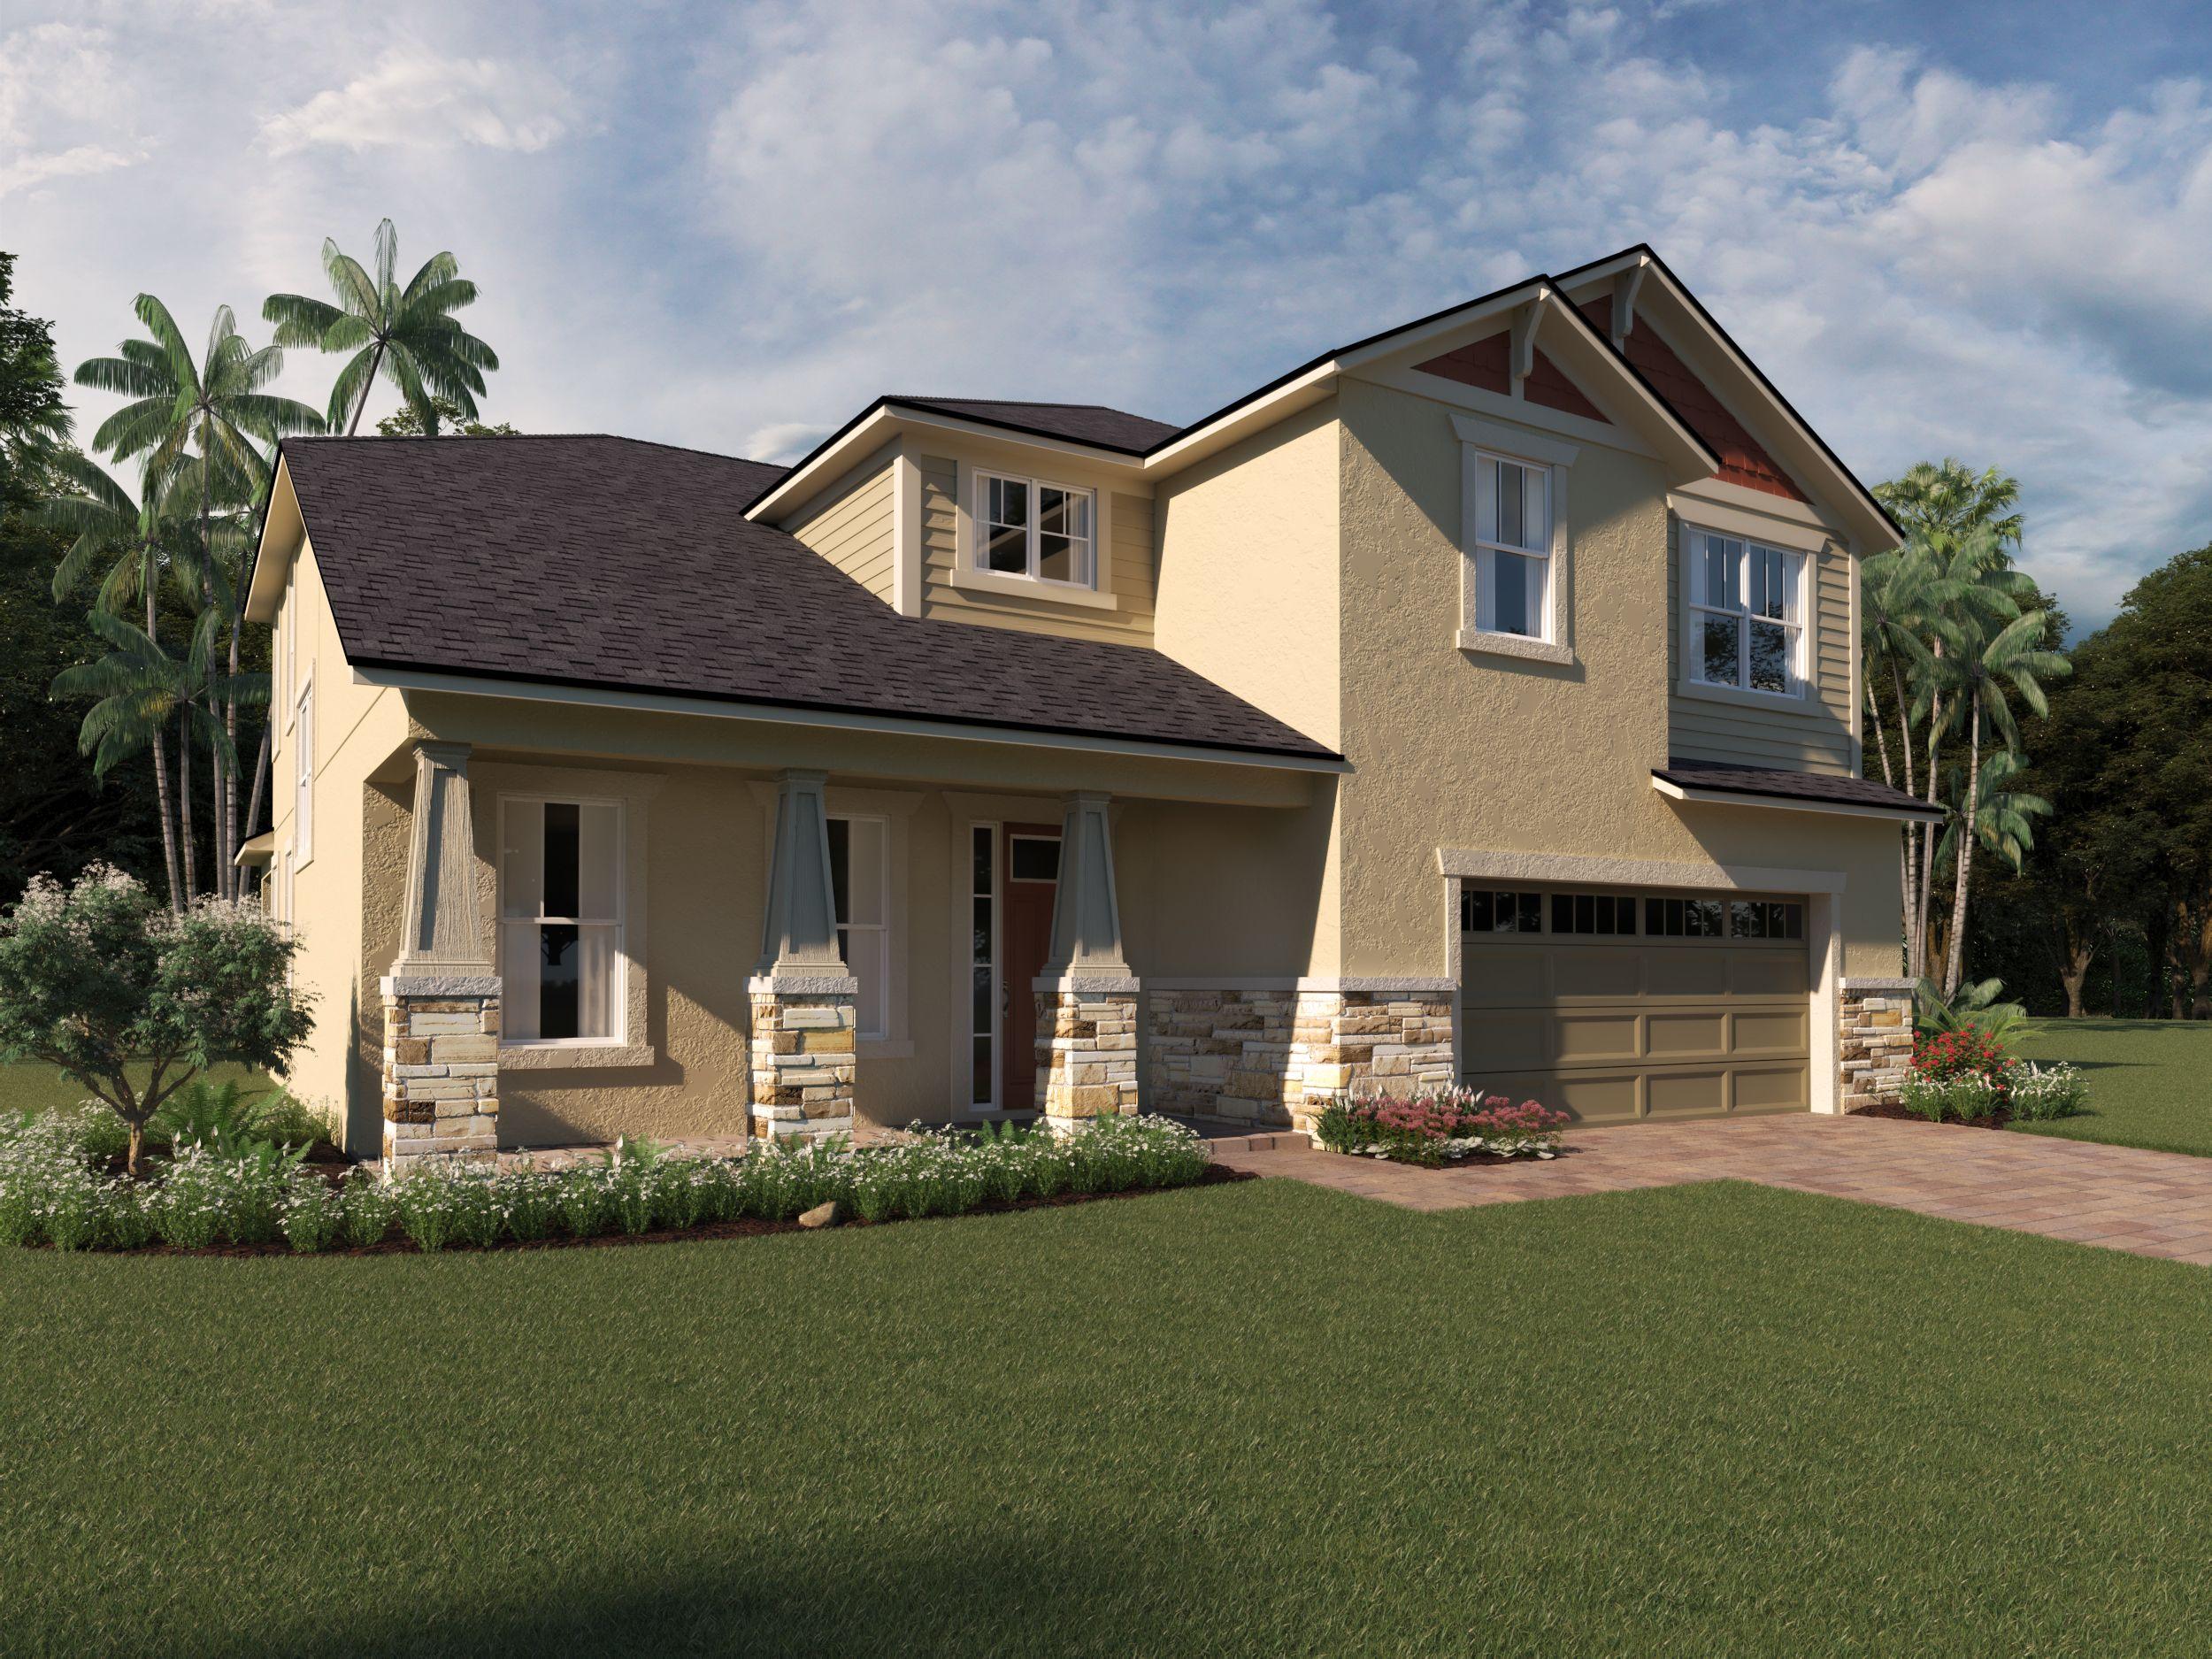 New Construction Homes & Plans in Ocoee, FL | 3,070 Homes ...